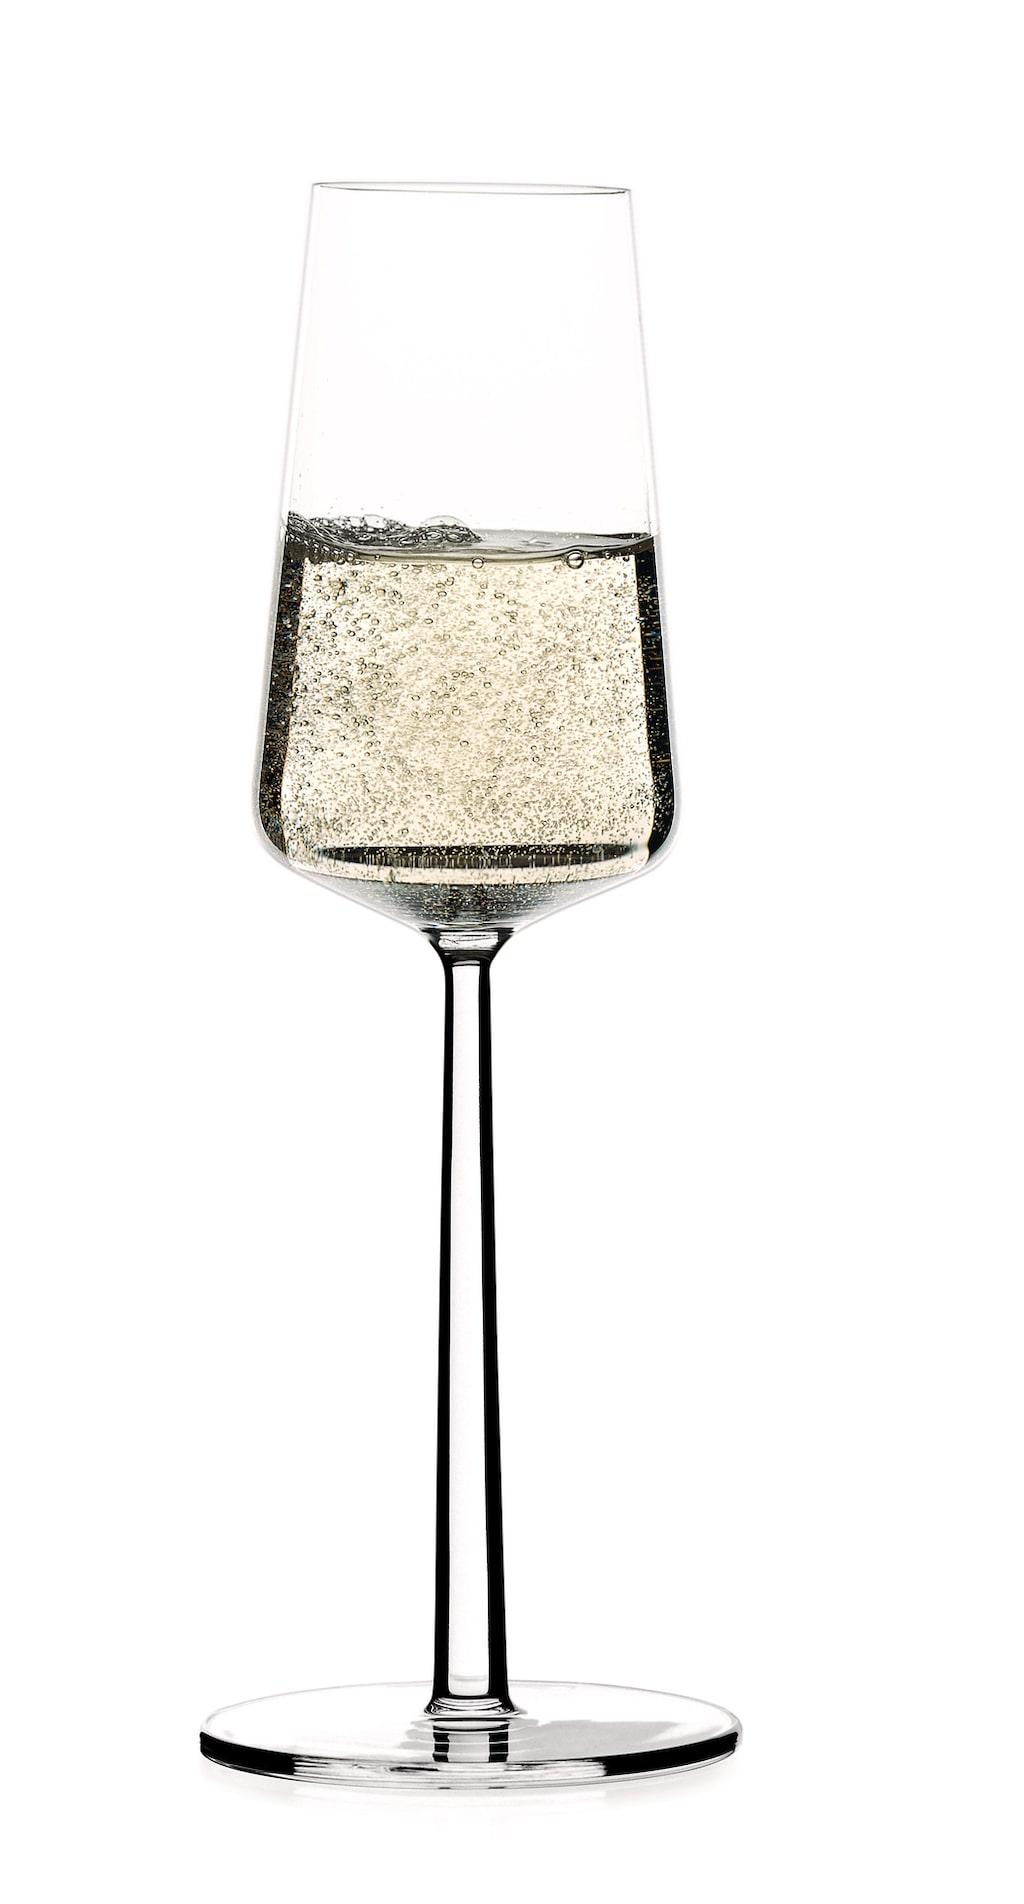 Essence champagneglas 2-pack, Iittala. Ordinarie pris: 299 kronor. Mellandagspris: 249 kronor.  Avänd koden XMAS.